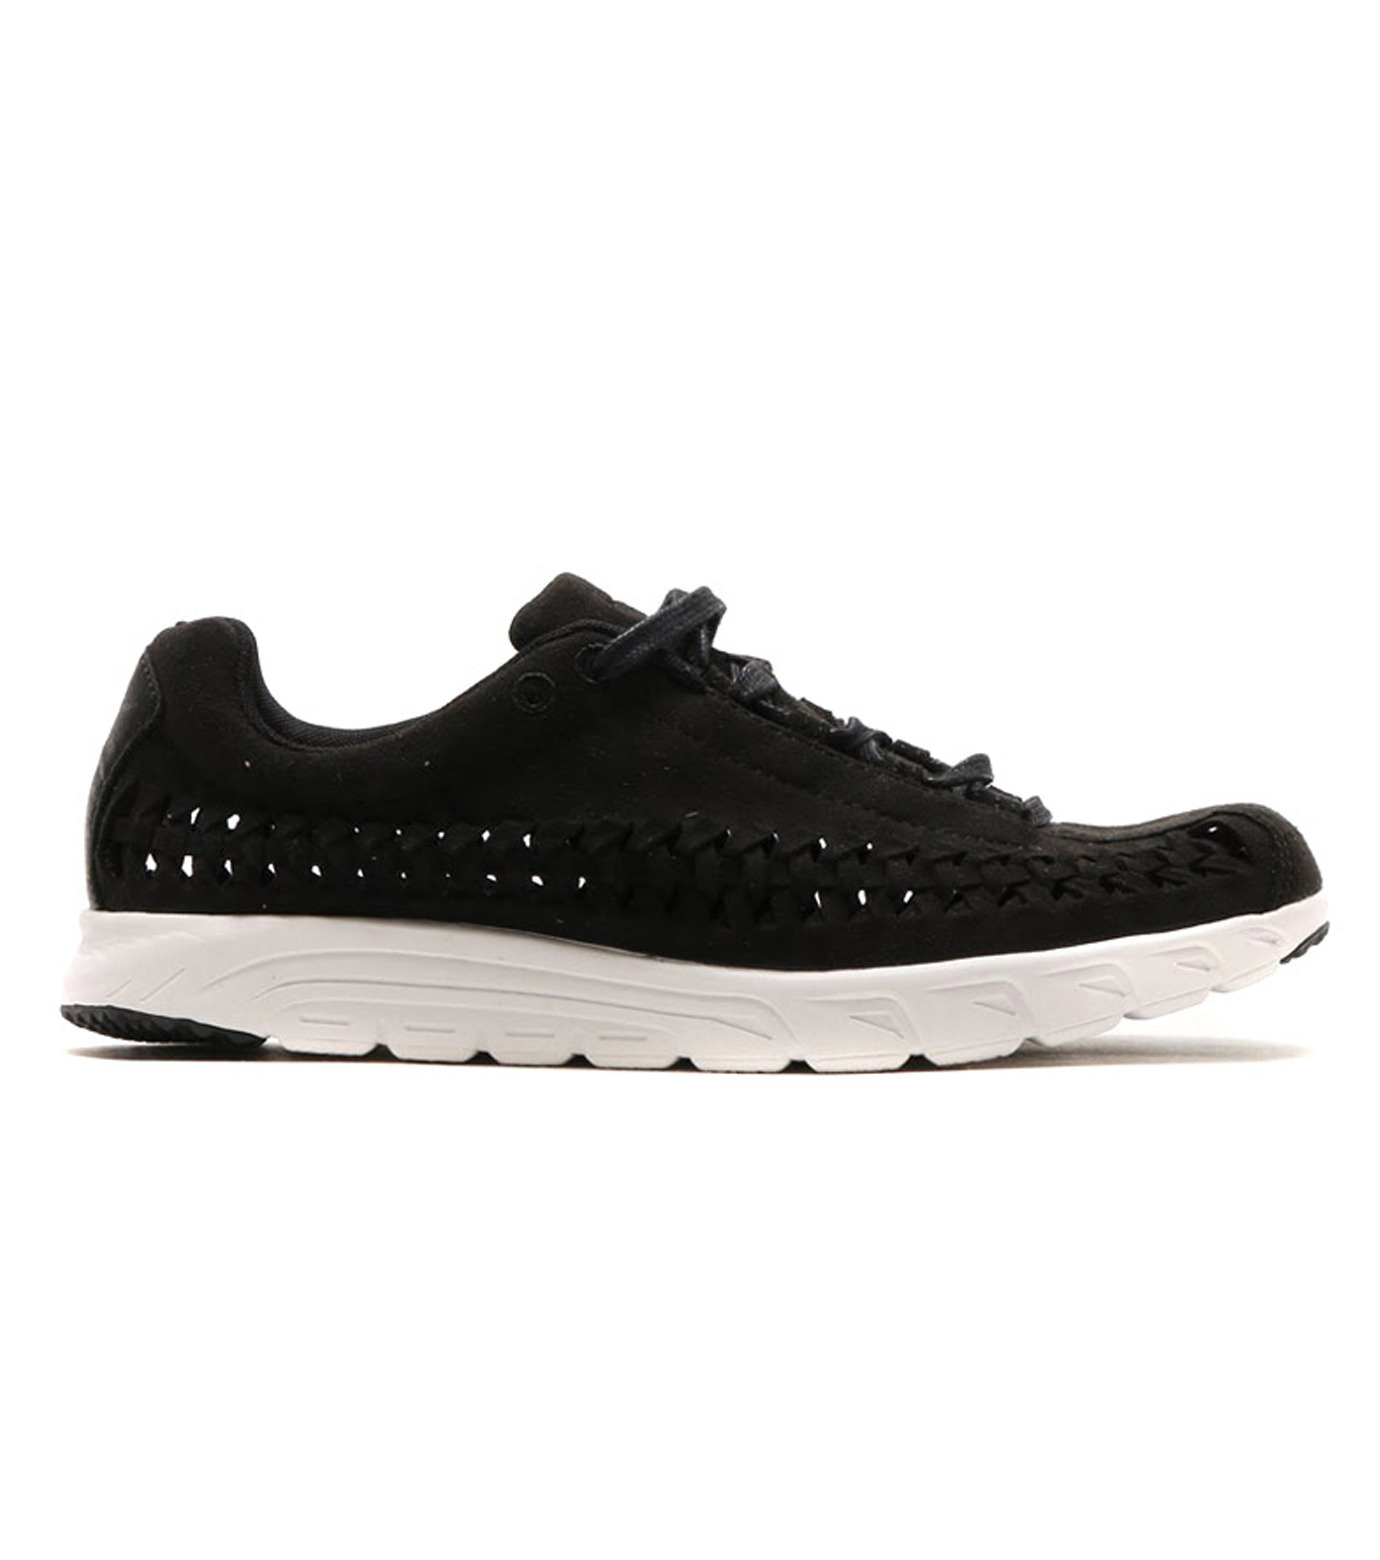 NIKE(ナイキ)のMAYFLY WOVEN-BLACK(シューズ/shoes)-833132-001-13 拡大詳細画像1